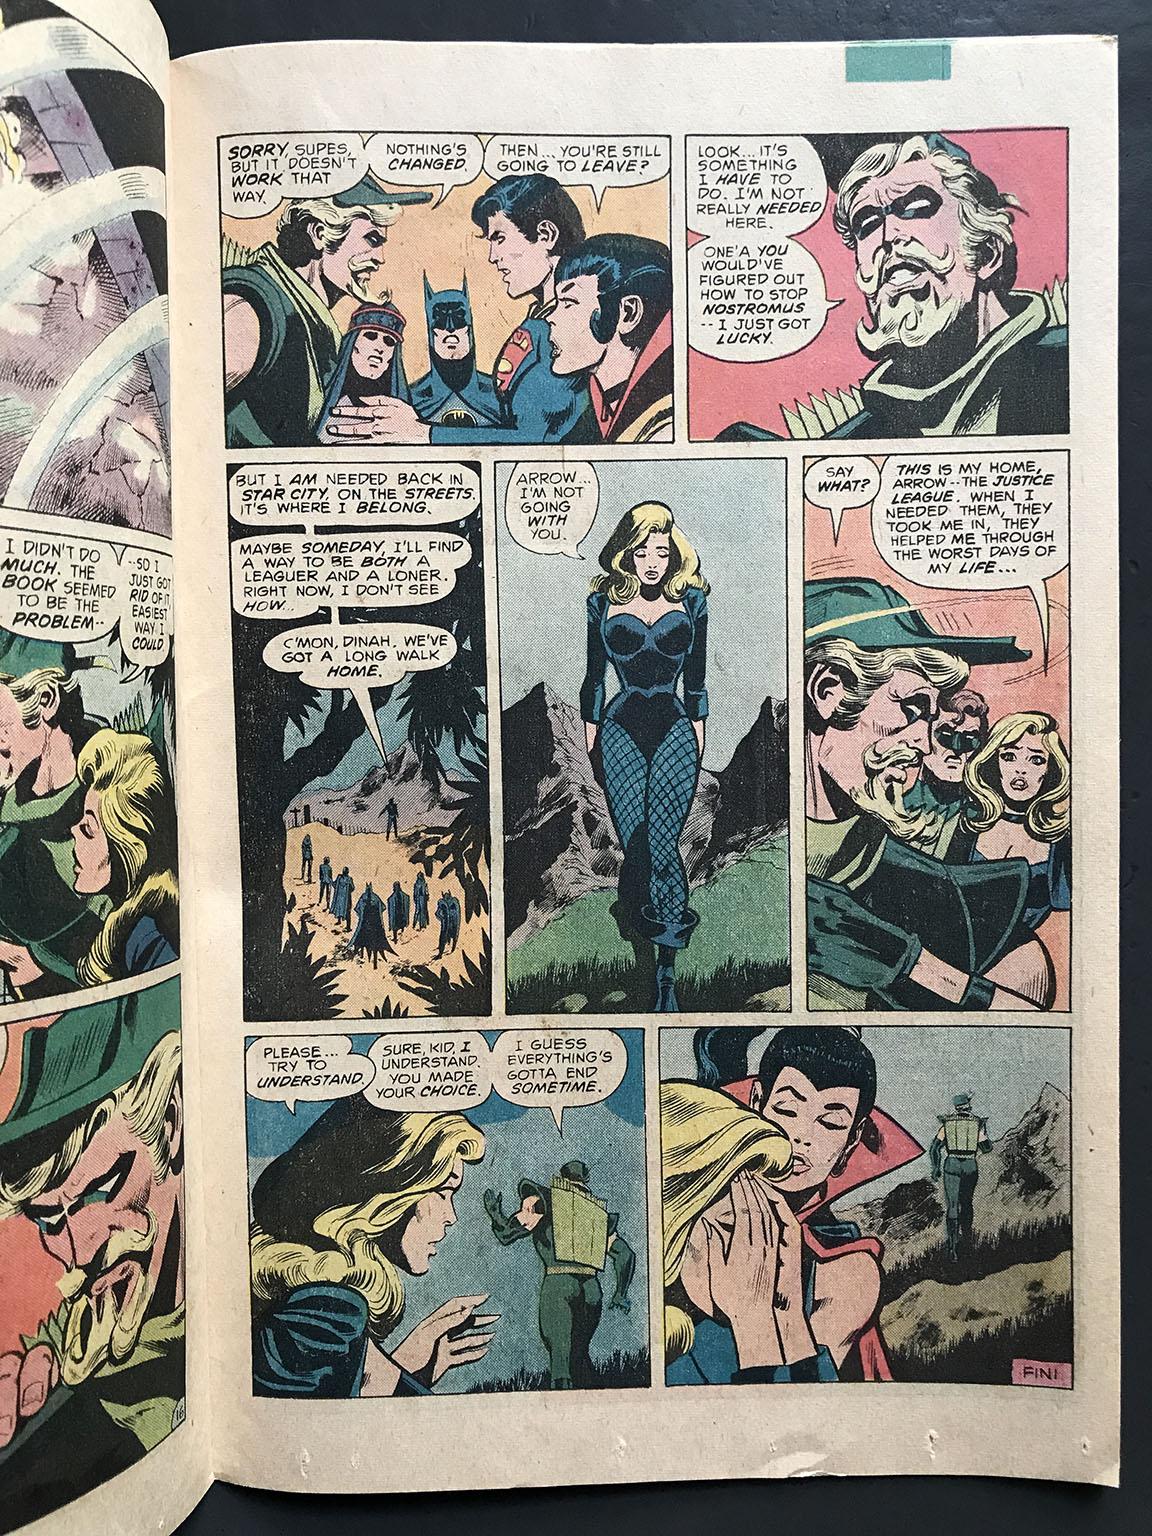 Michel Fiffe » OVERWORD 4 · Justice League of America